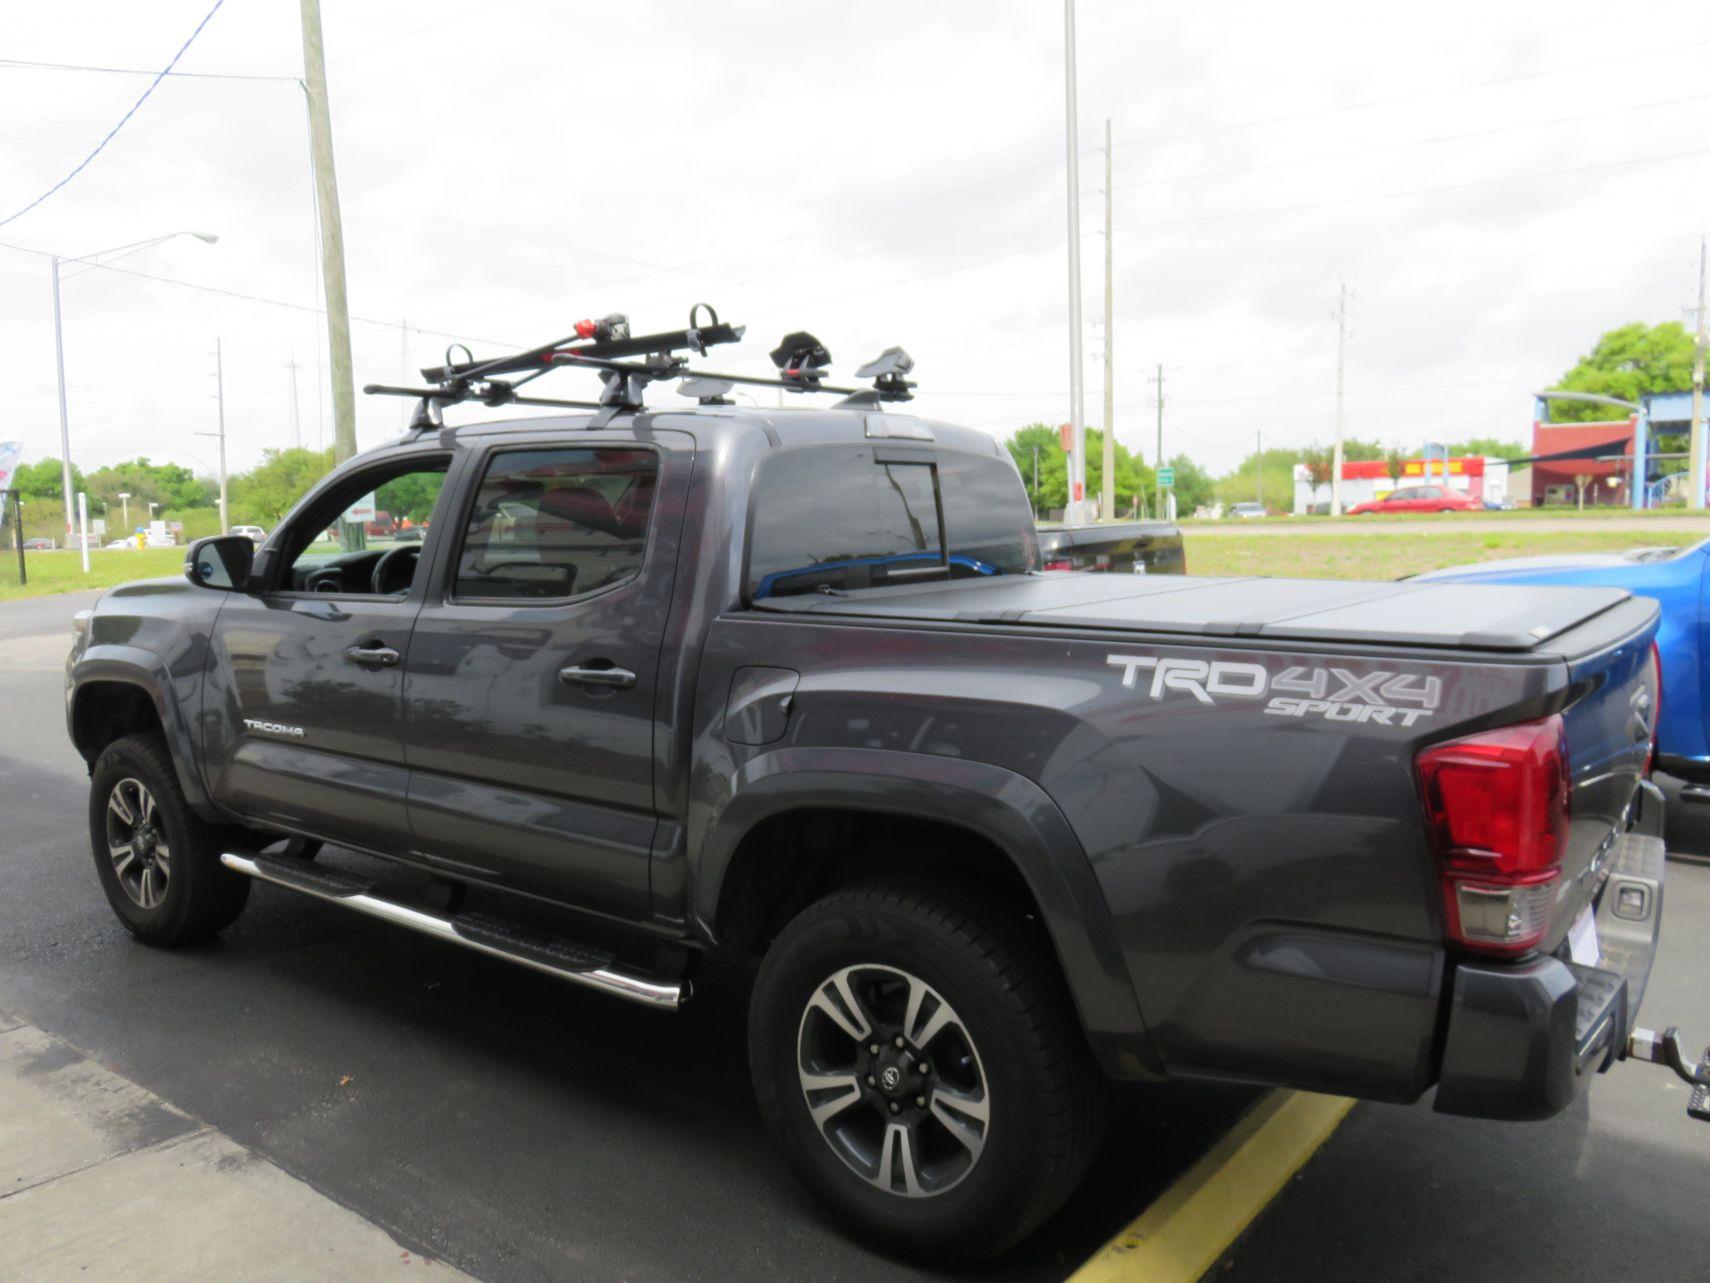 2019 Grey Toyota Tacoma Leer 350m Yakima Roof Rack